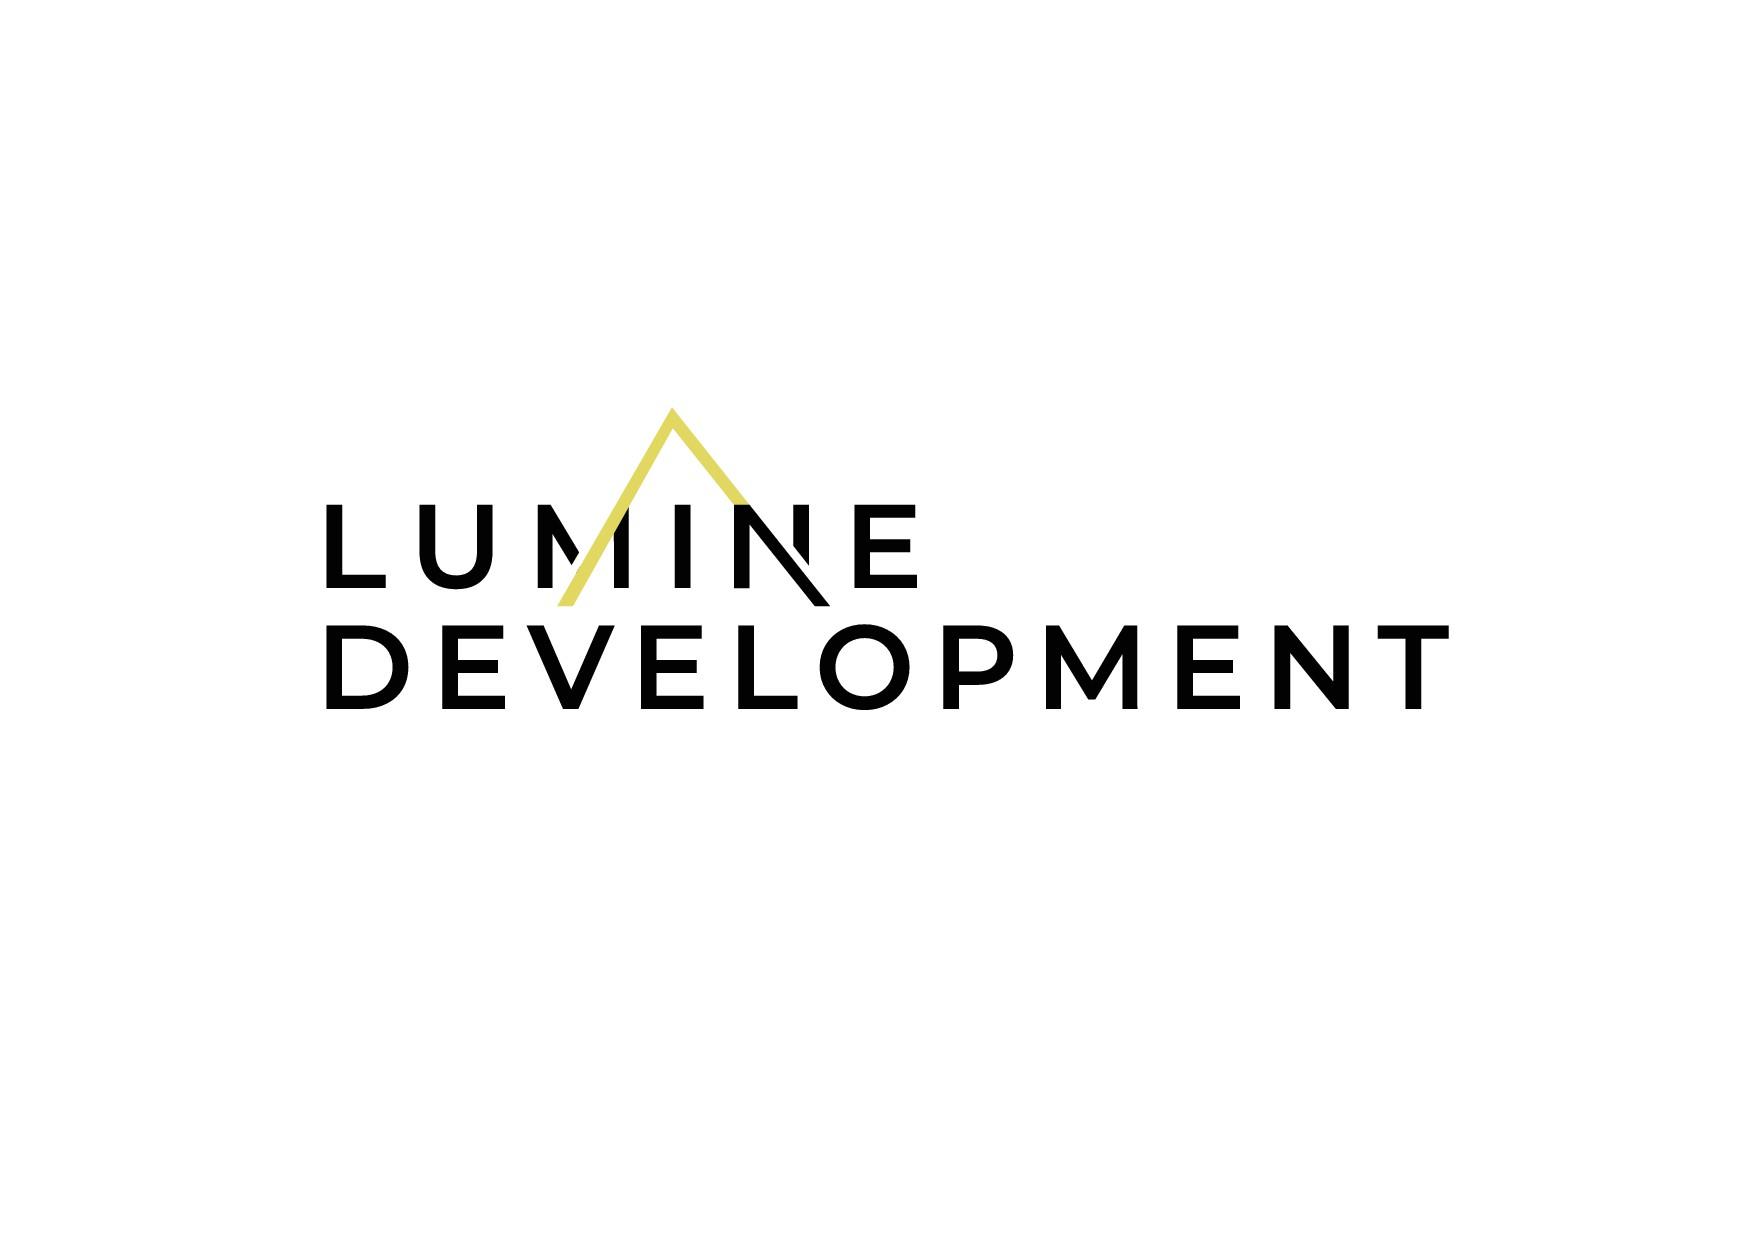 Lumine Development calls for top designers